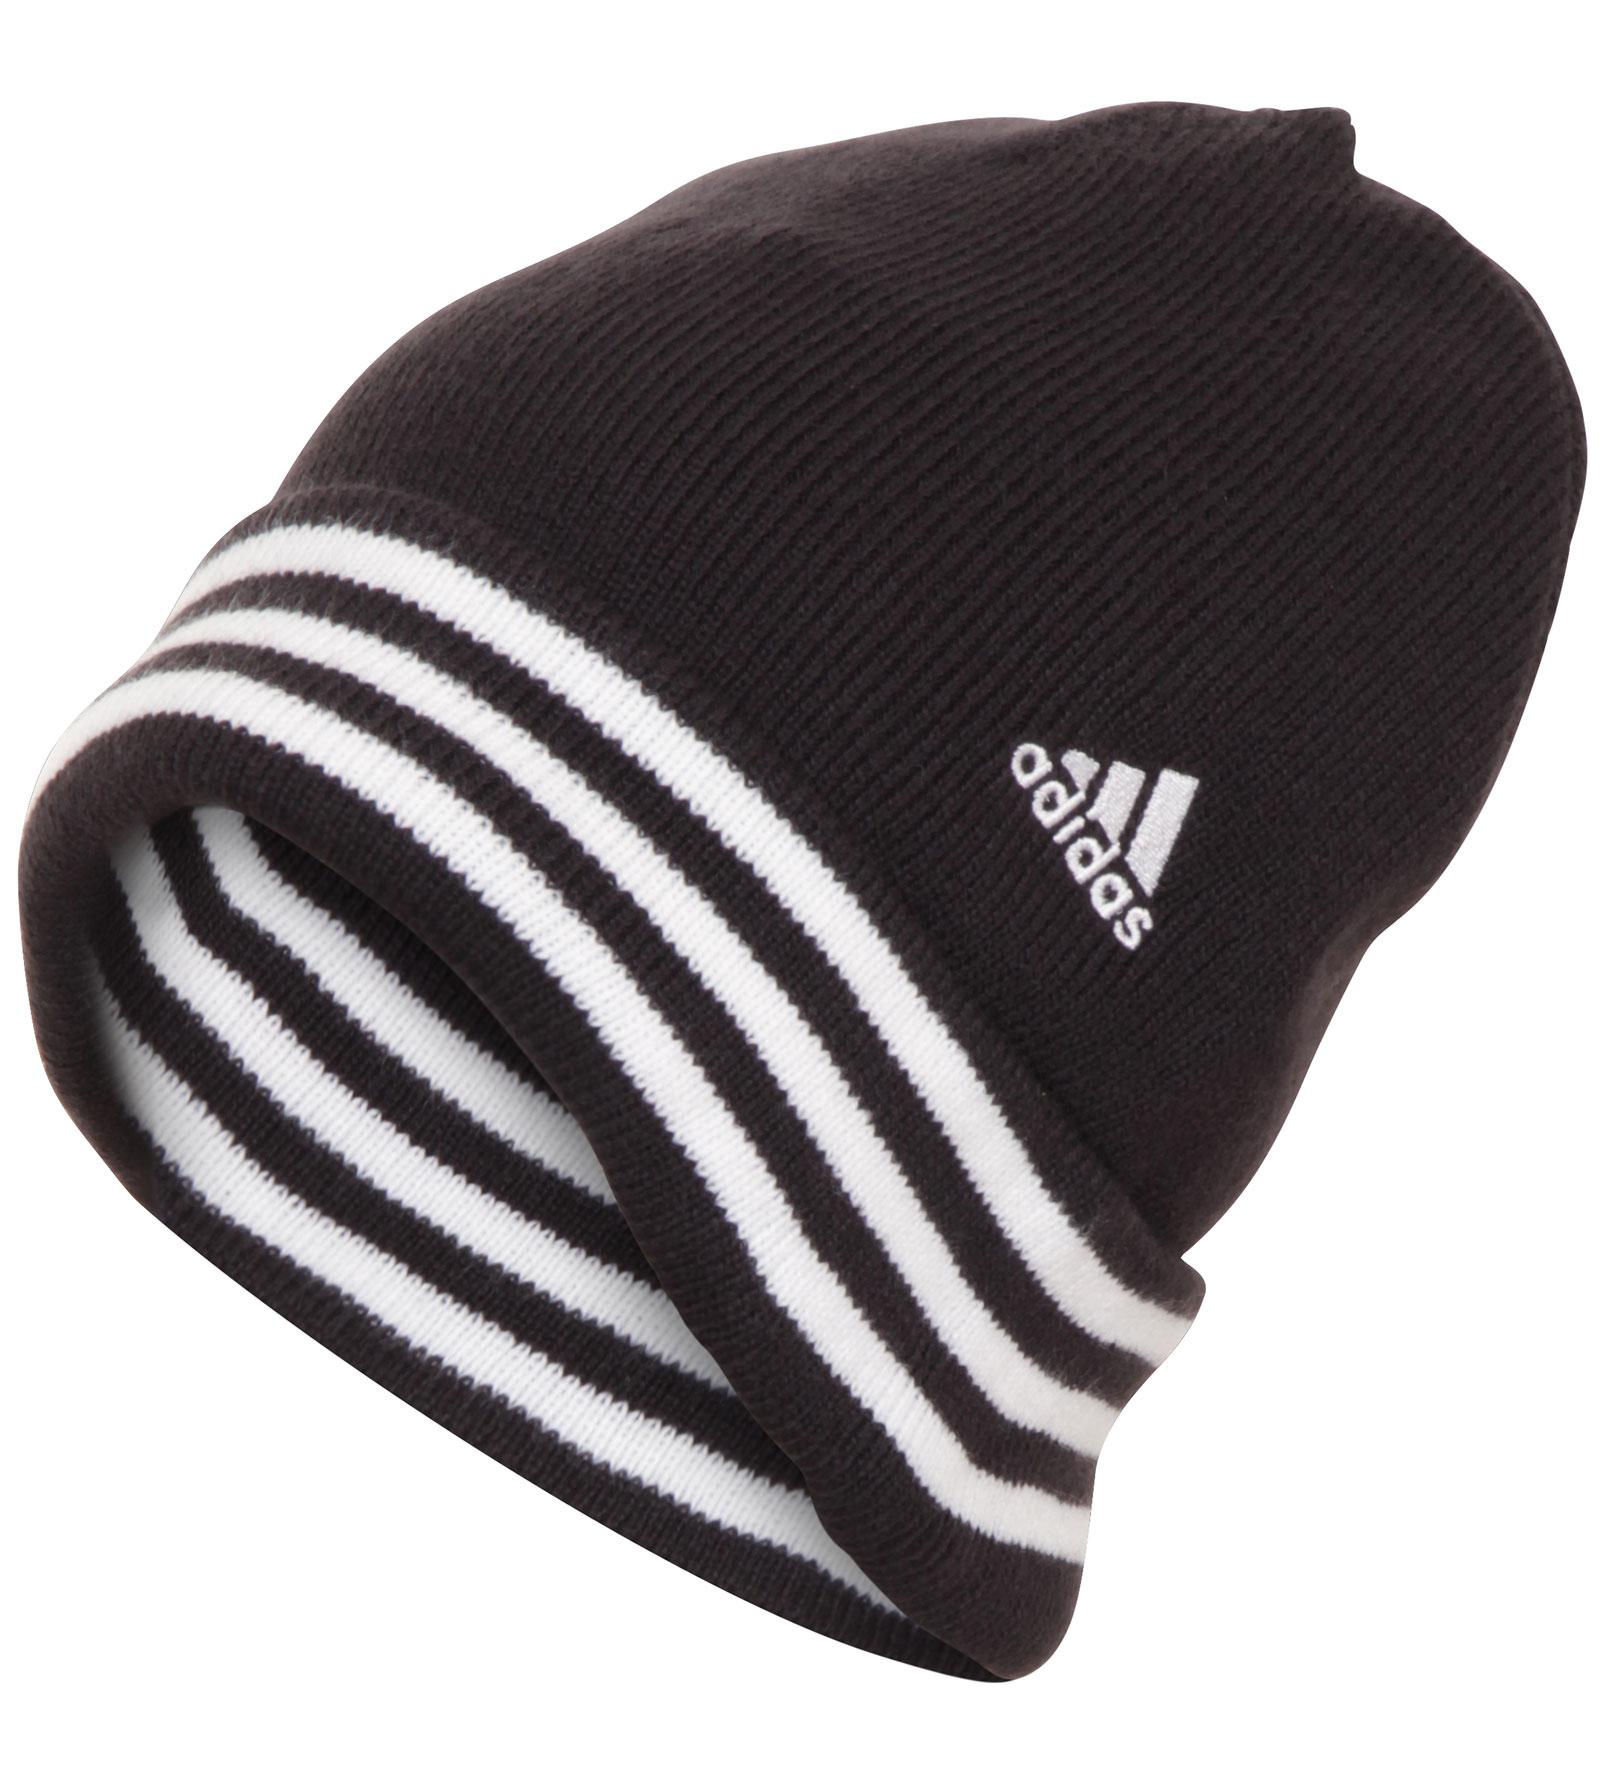 adidas uomo cappello invernale